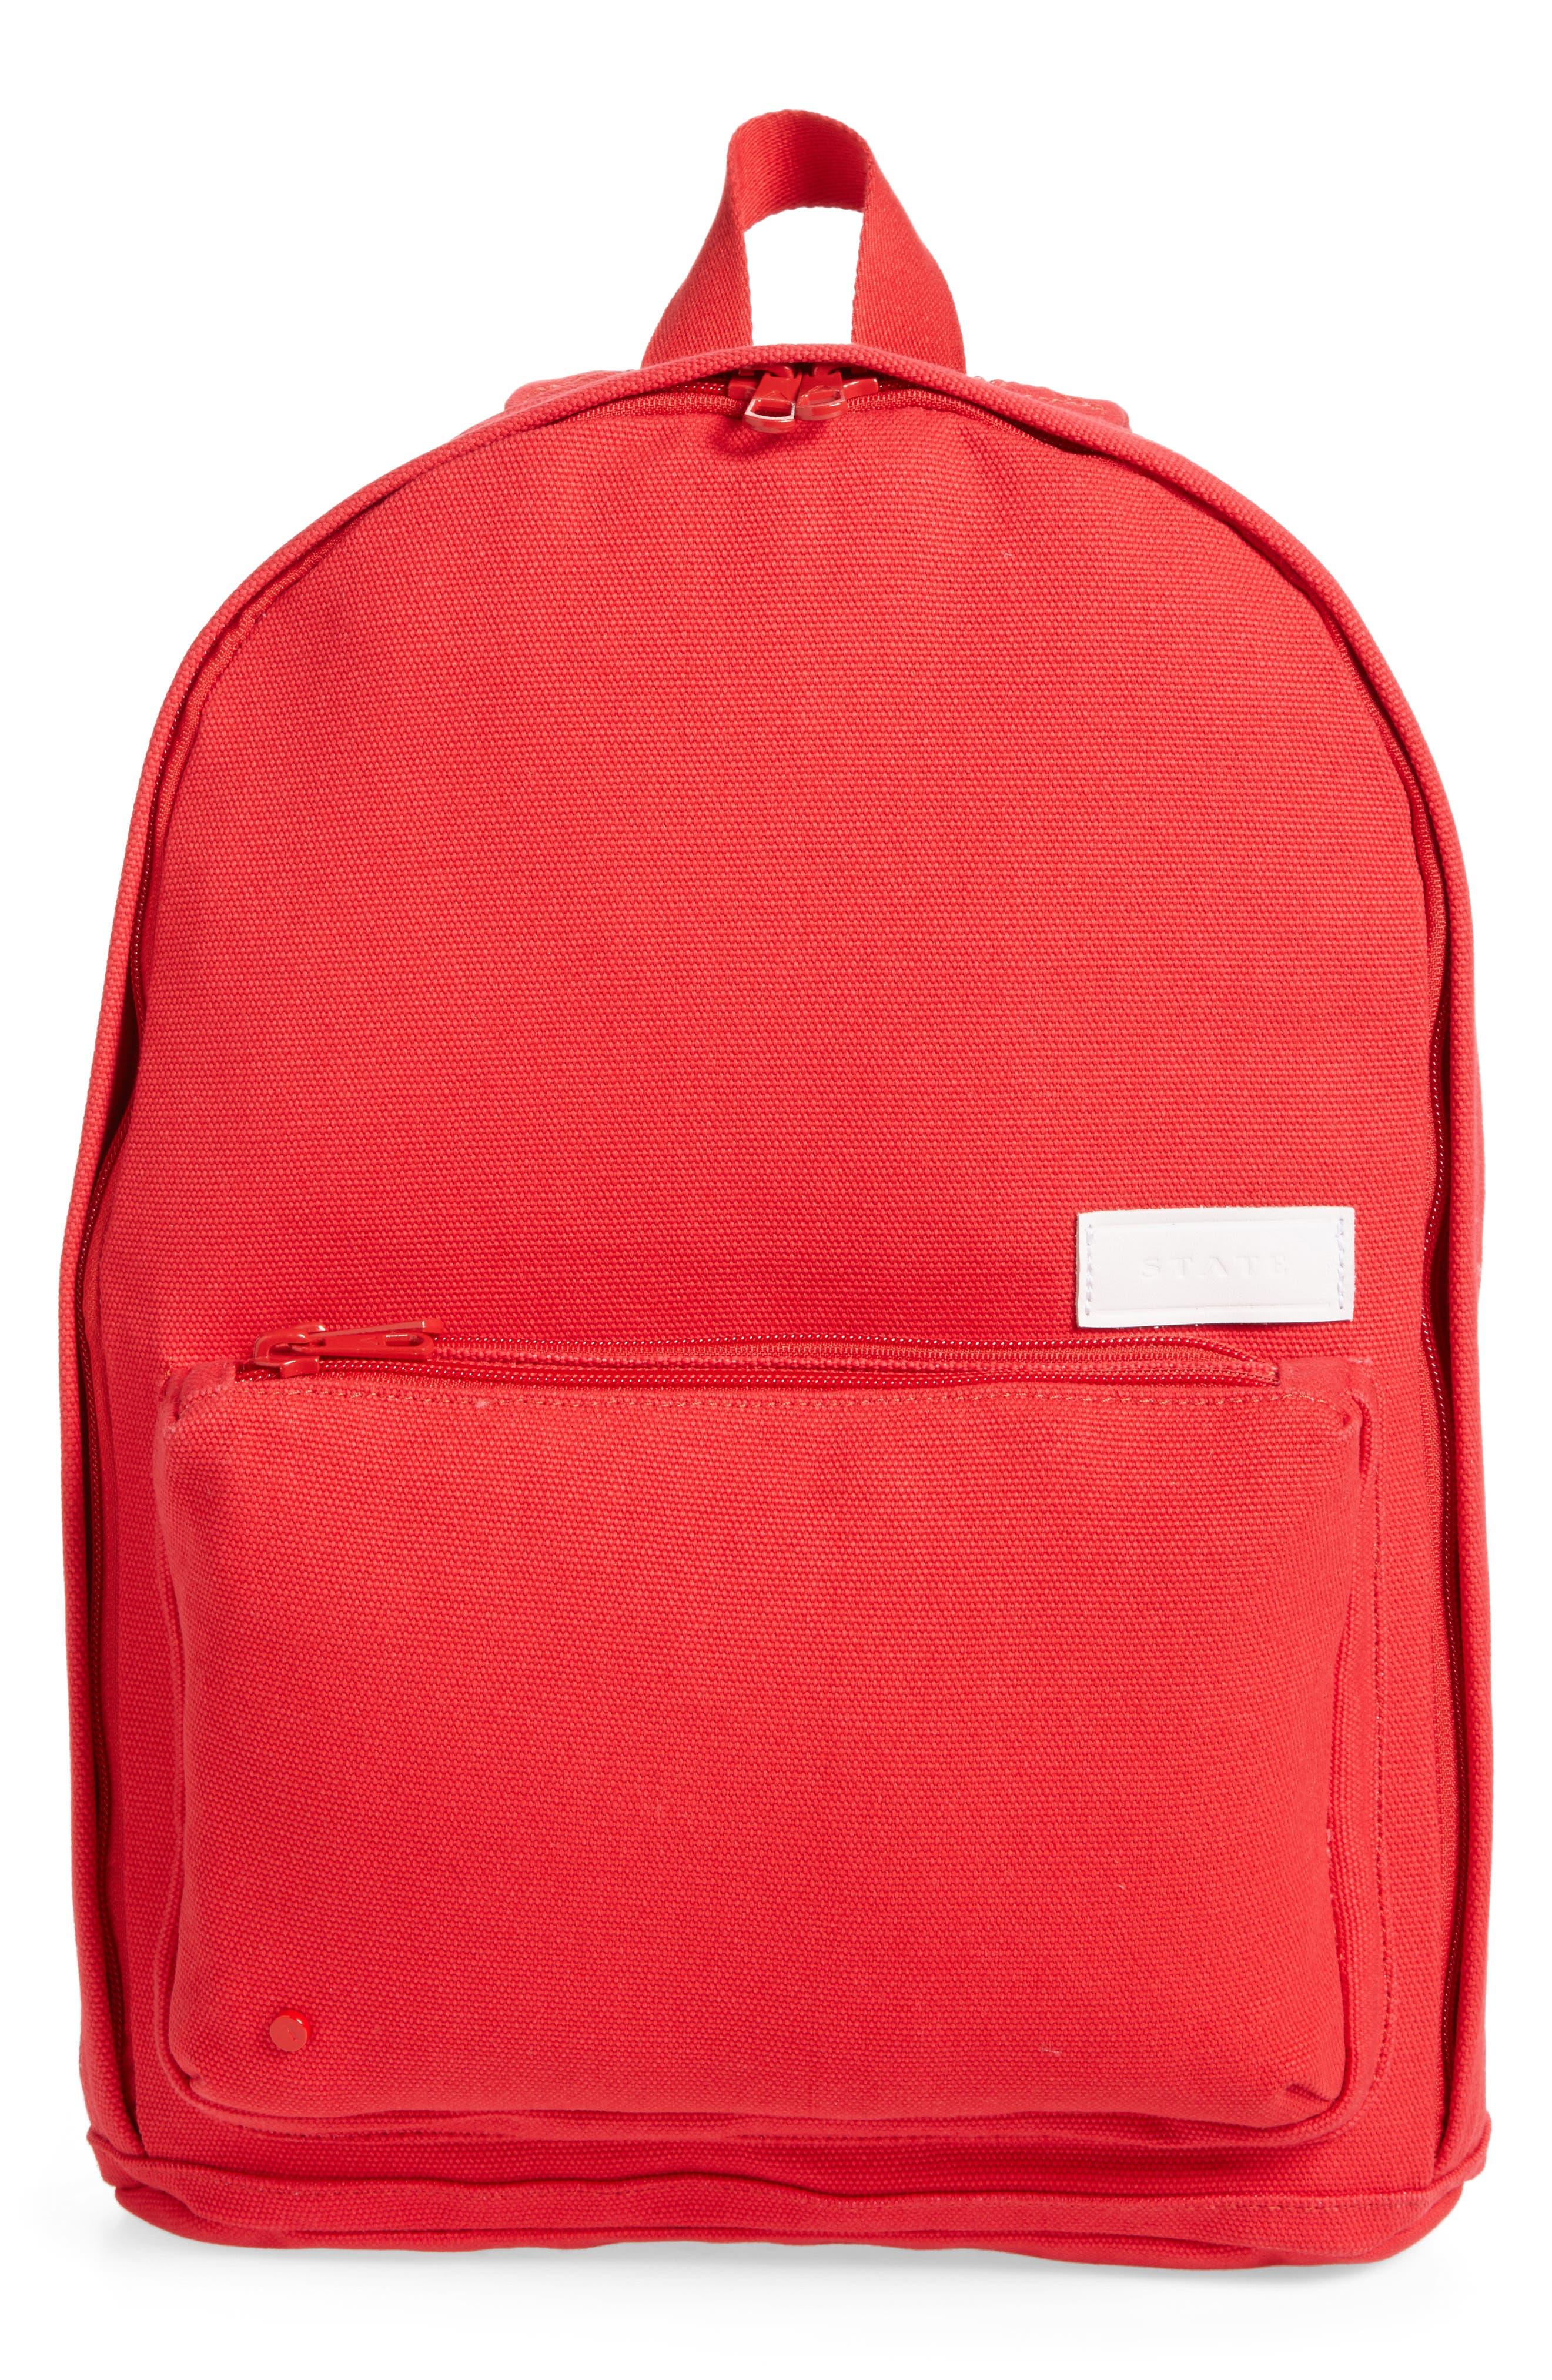 Alternate Image 1 Selected - STATE Bags Slim Lorimer Water Resistant Canvas Backpack